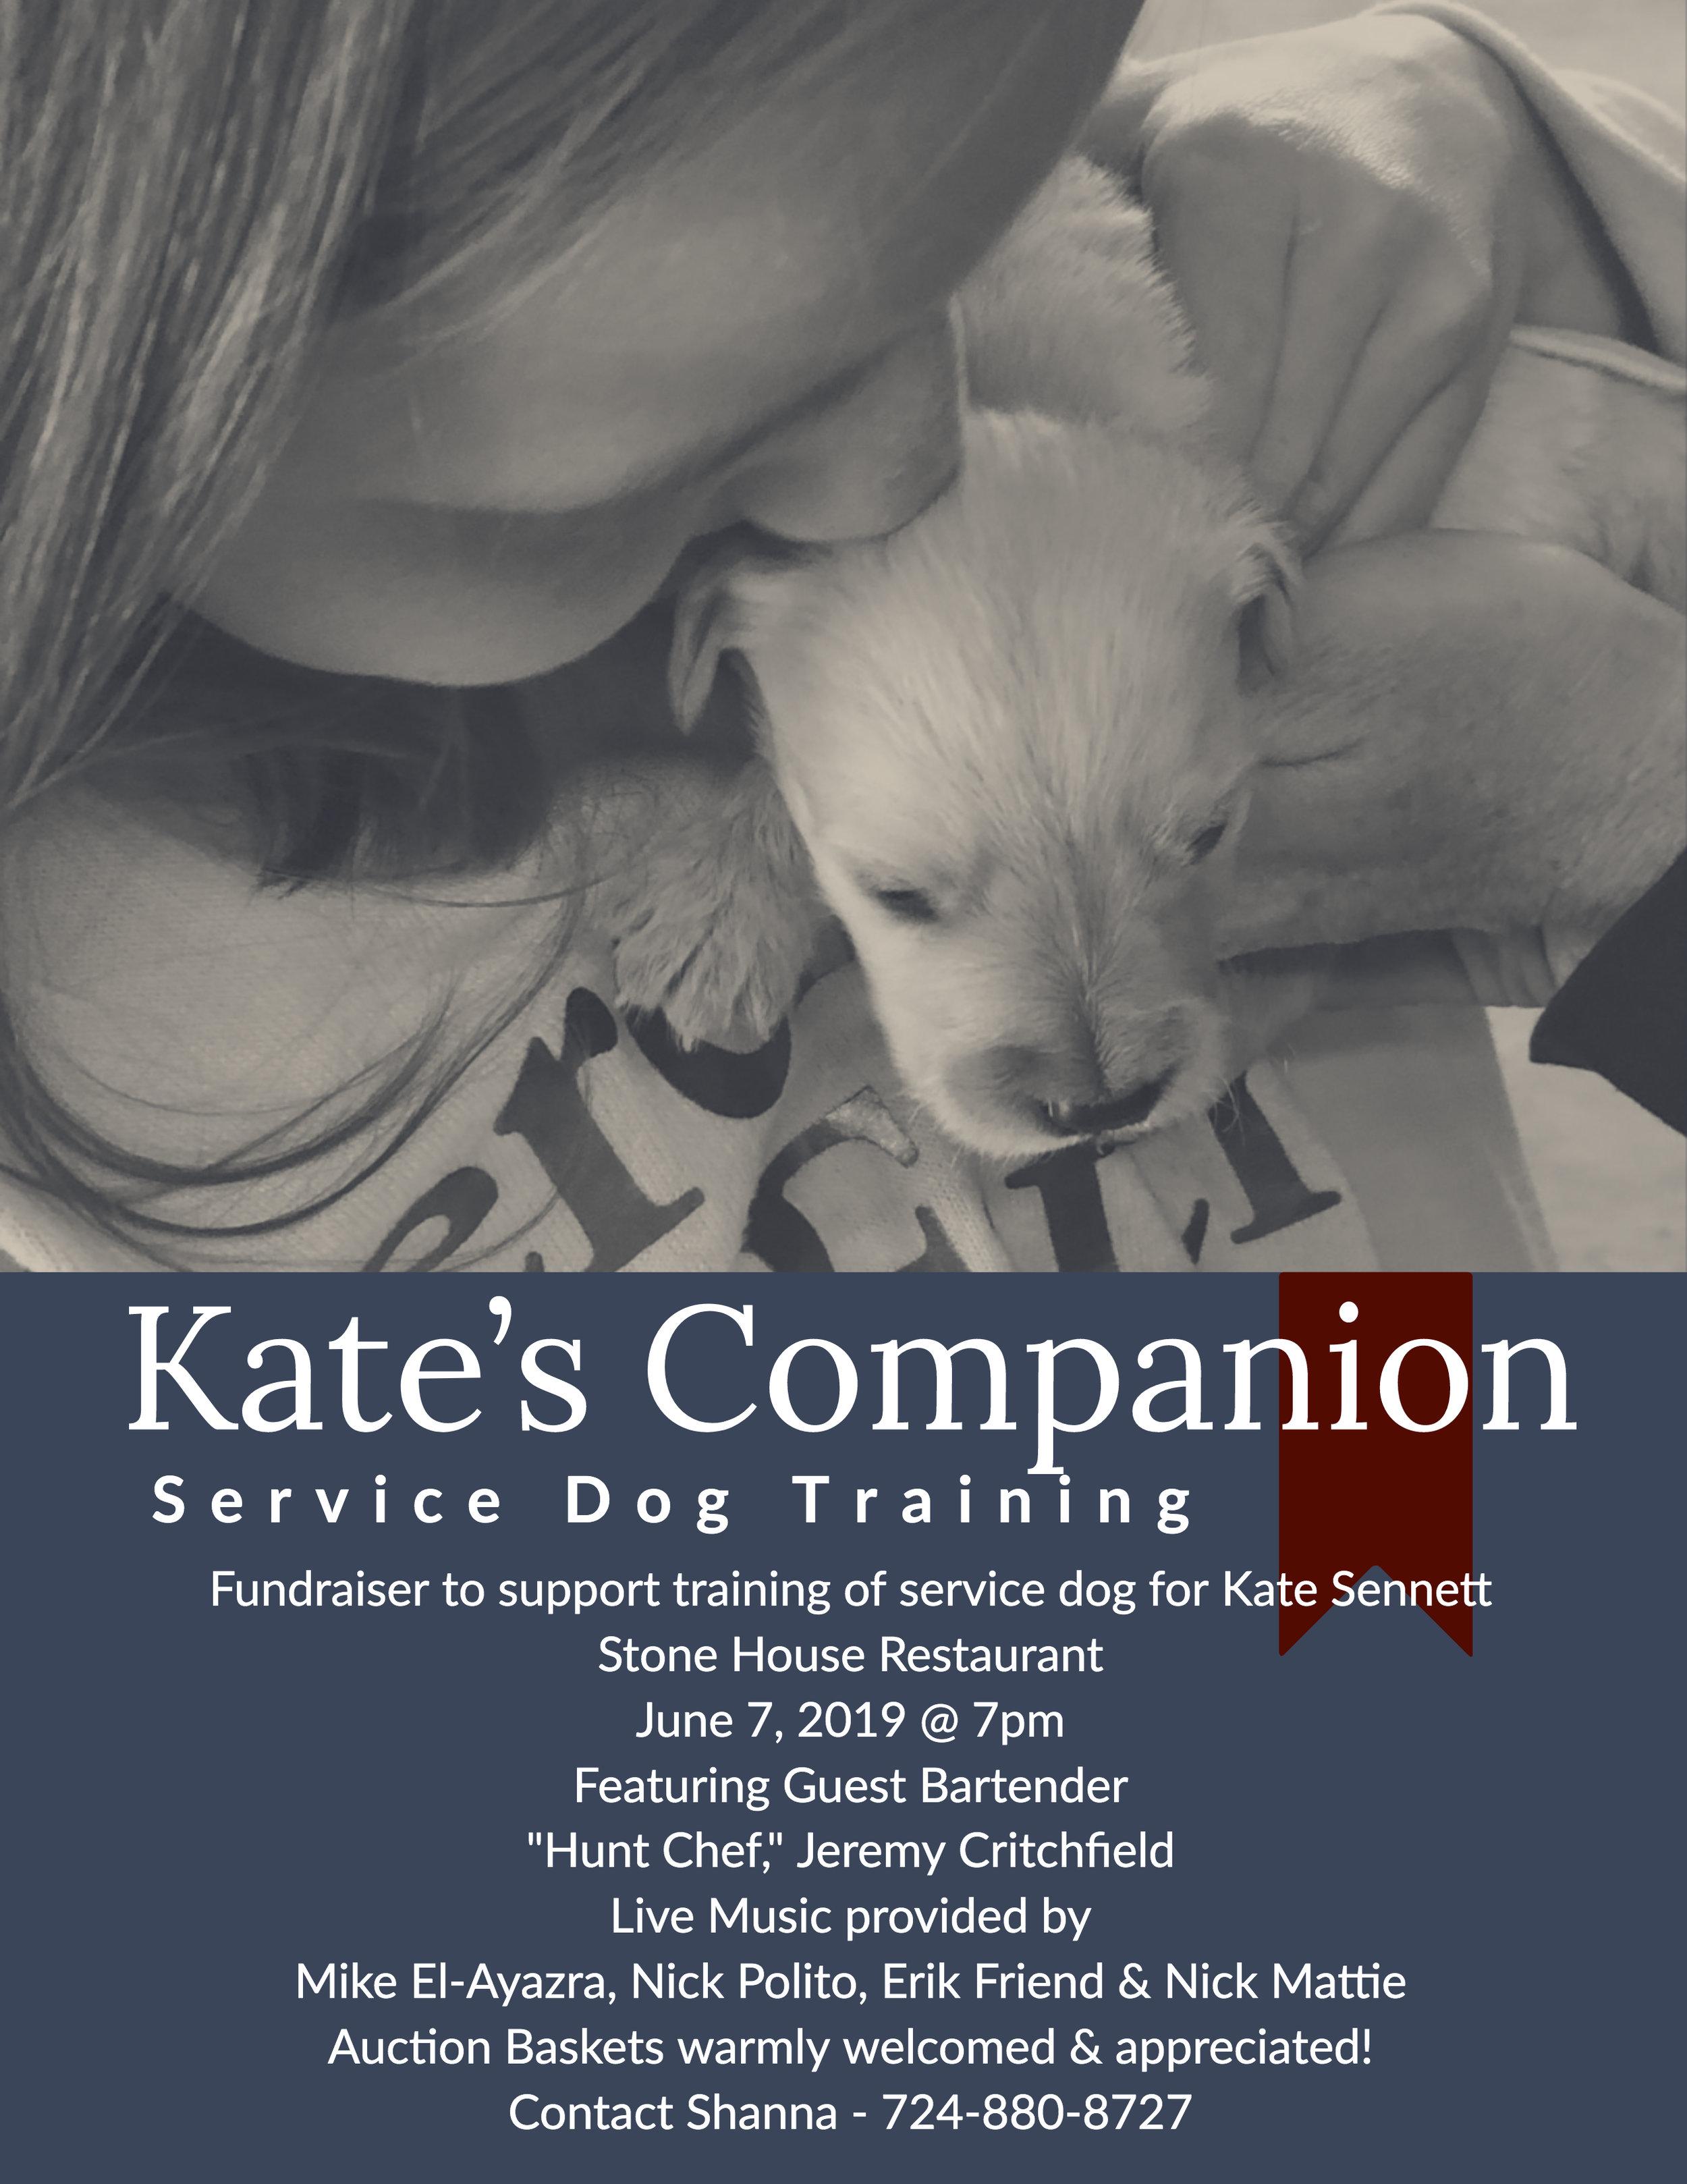 060719 Kate's Companion (1).jpg